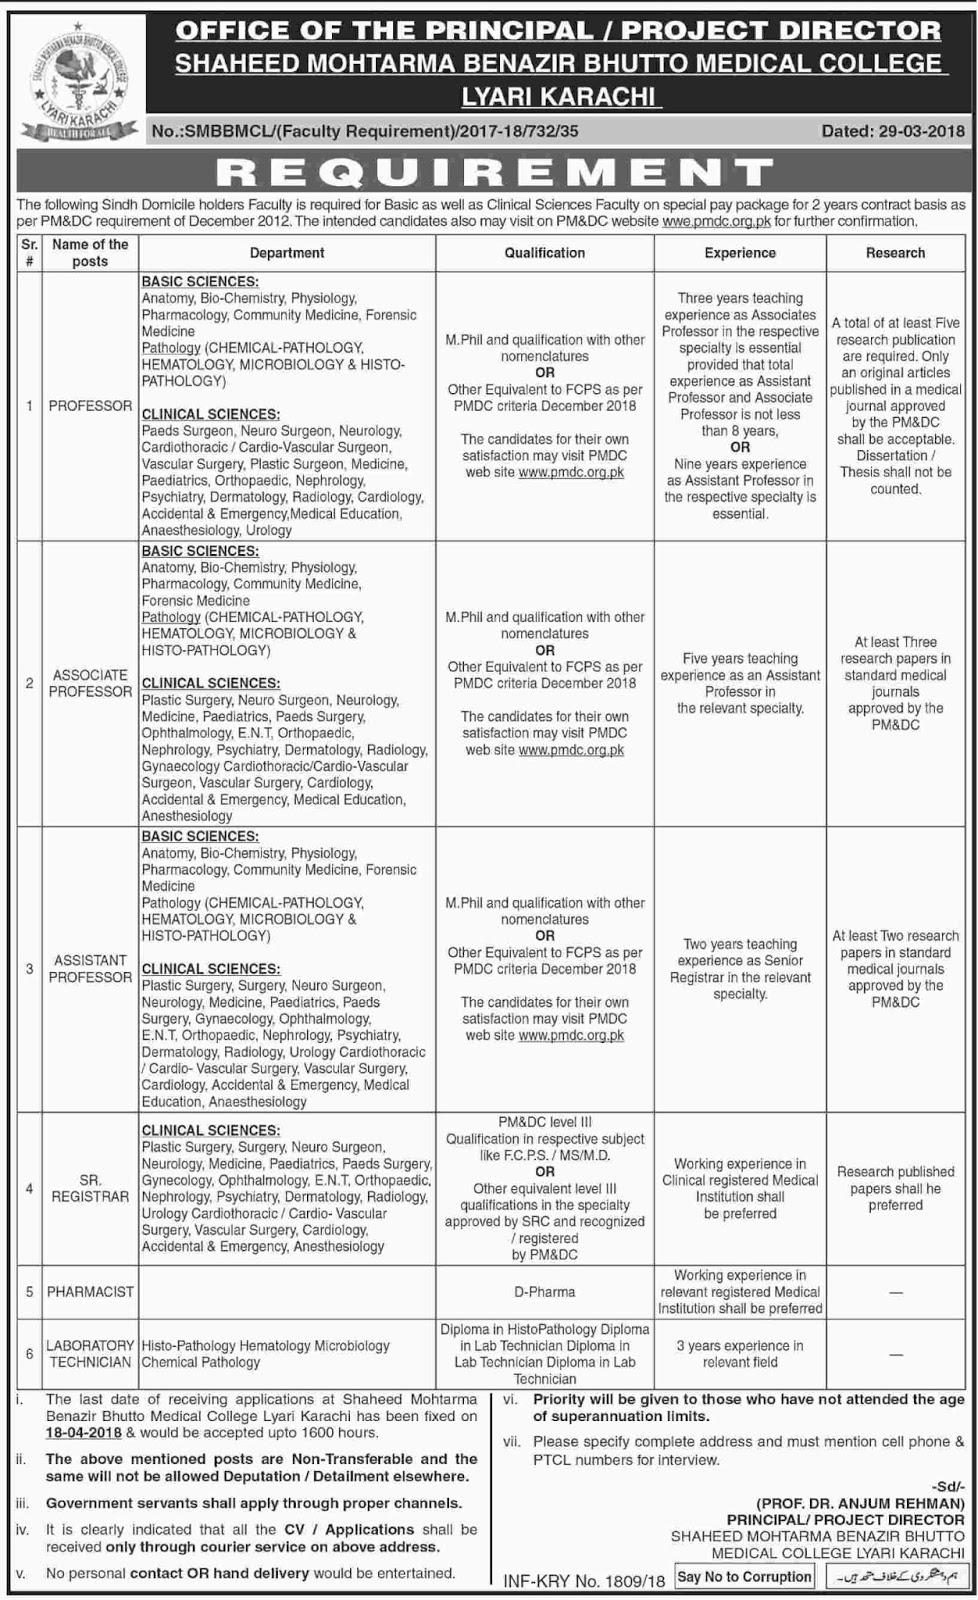 Shaheed Mohtarma Benazir Bhutto Medical College Jobs in Karachi